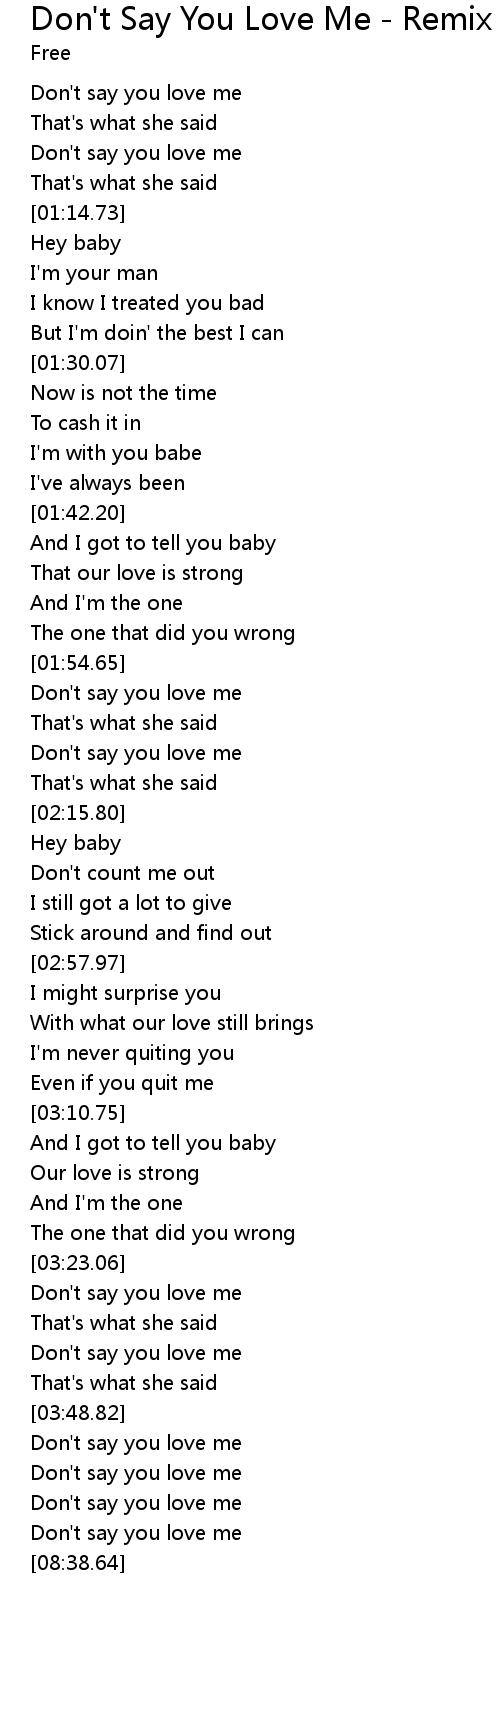 free don t say you love me lyrics